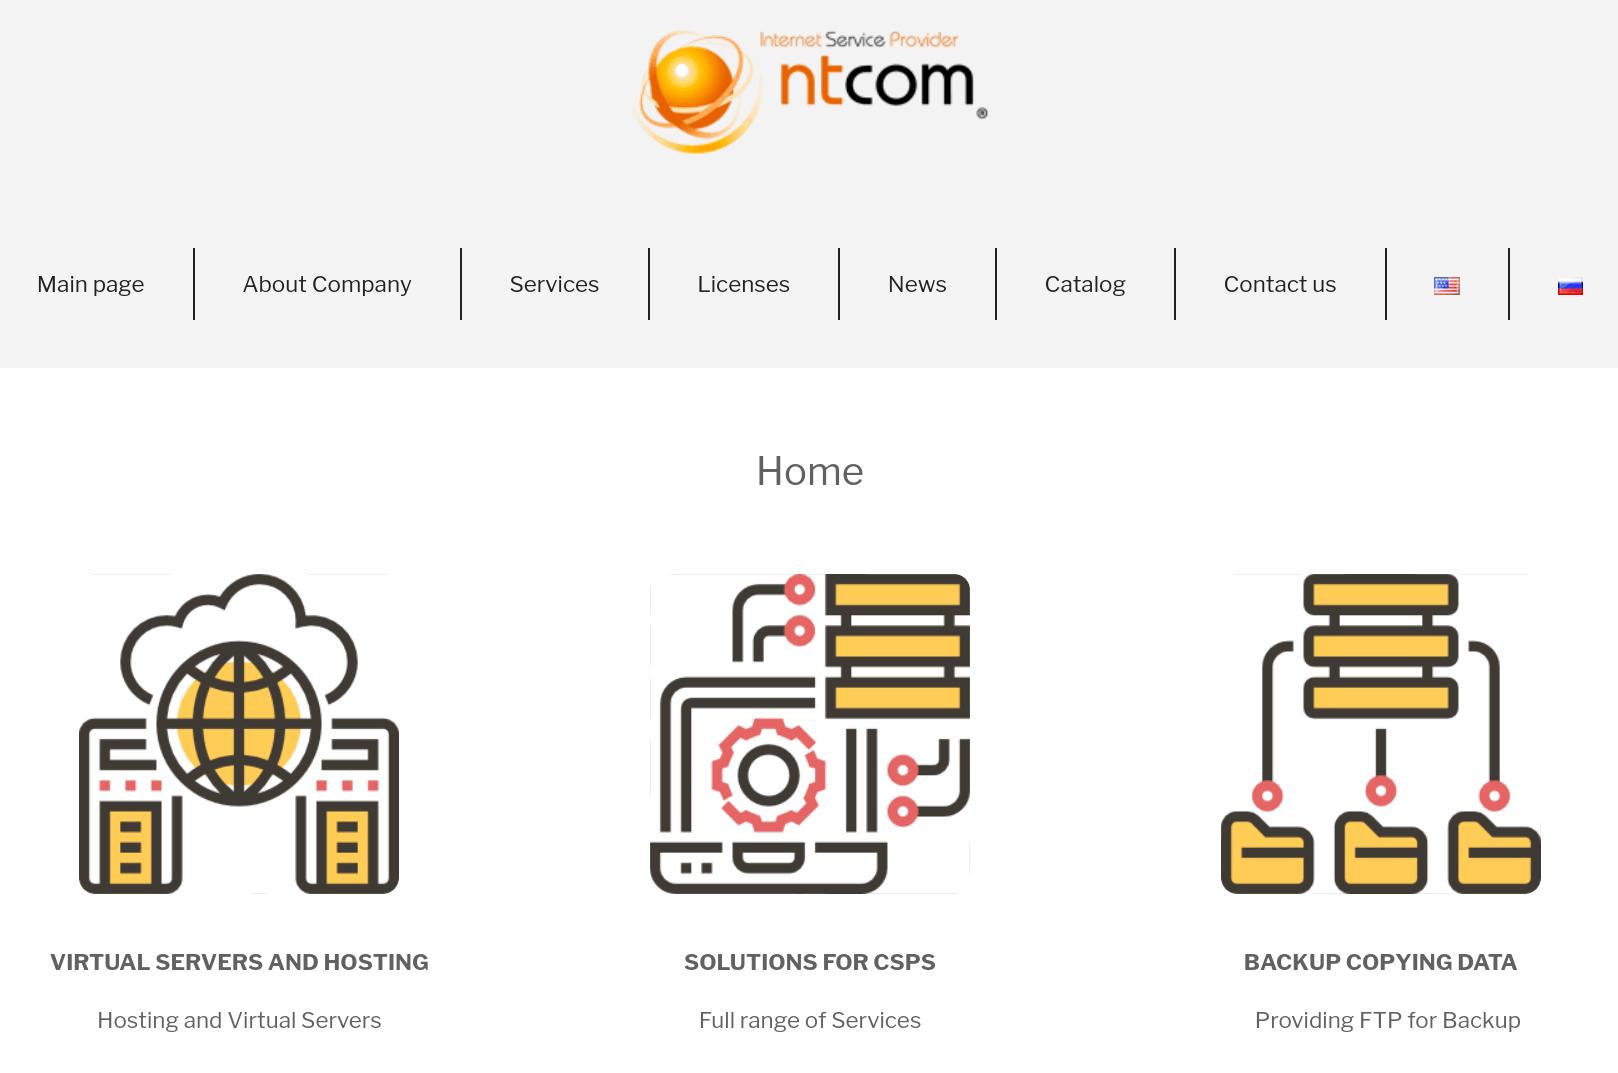 NTCOM